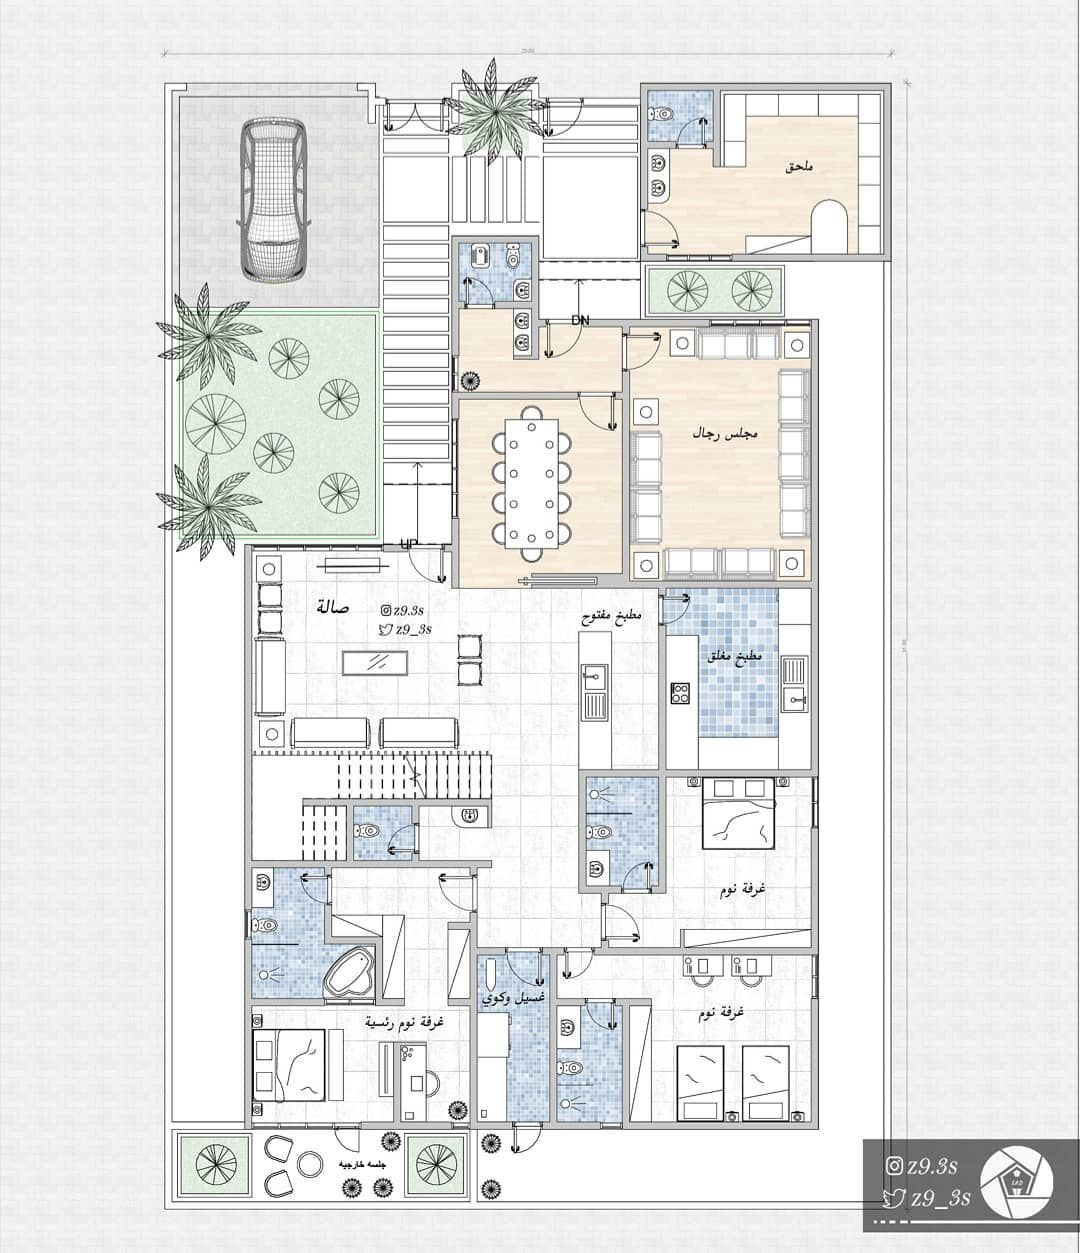 South Studio On Instagram تصميم فيلا سكنية بمساحة ٣٢٣م٢ تصميم تصميم داخلي تصميم معماري تصميمي تص Model House Plan Basement House Plans Family House Plans